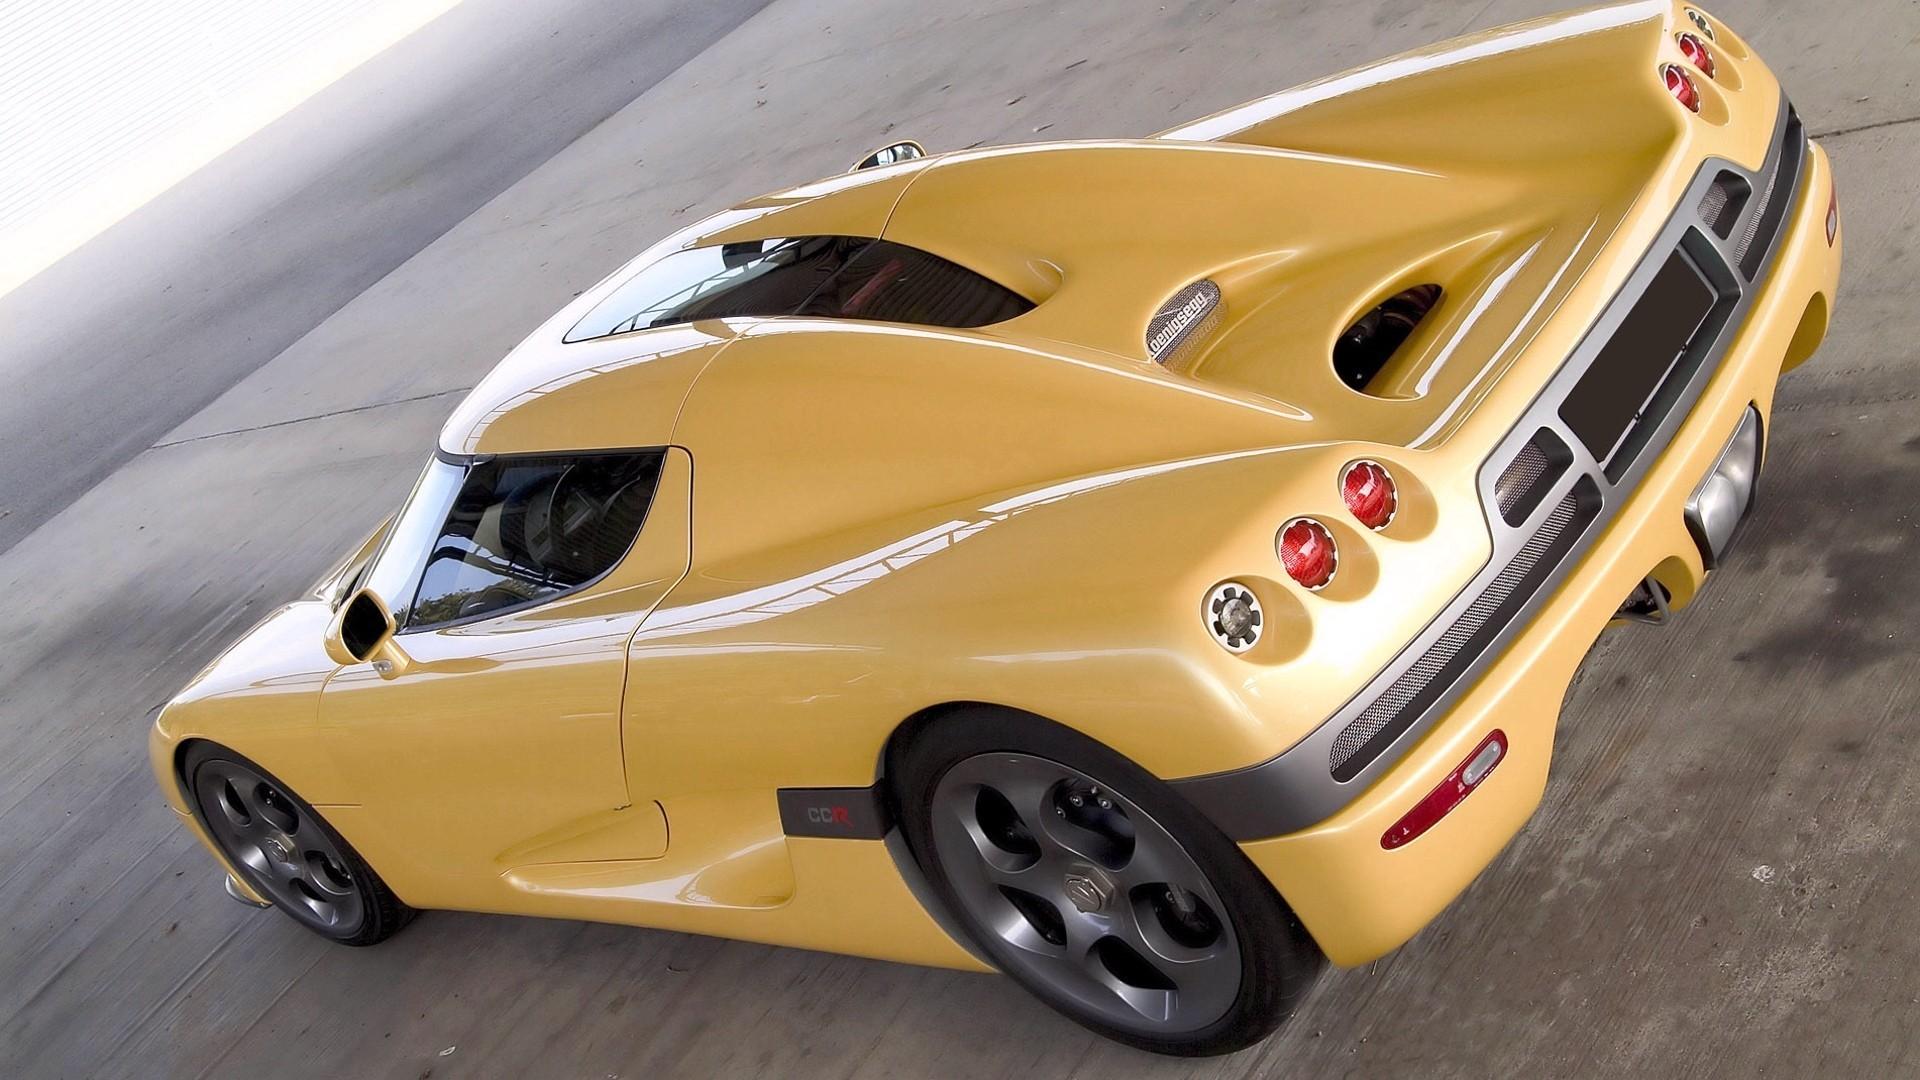 Fondos De Pantalla Vehiculo Coche Deportivo Koenigsegg Coches